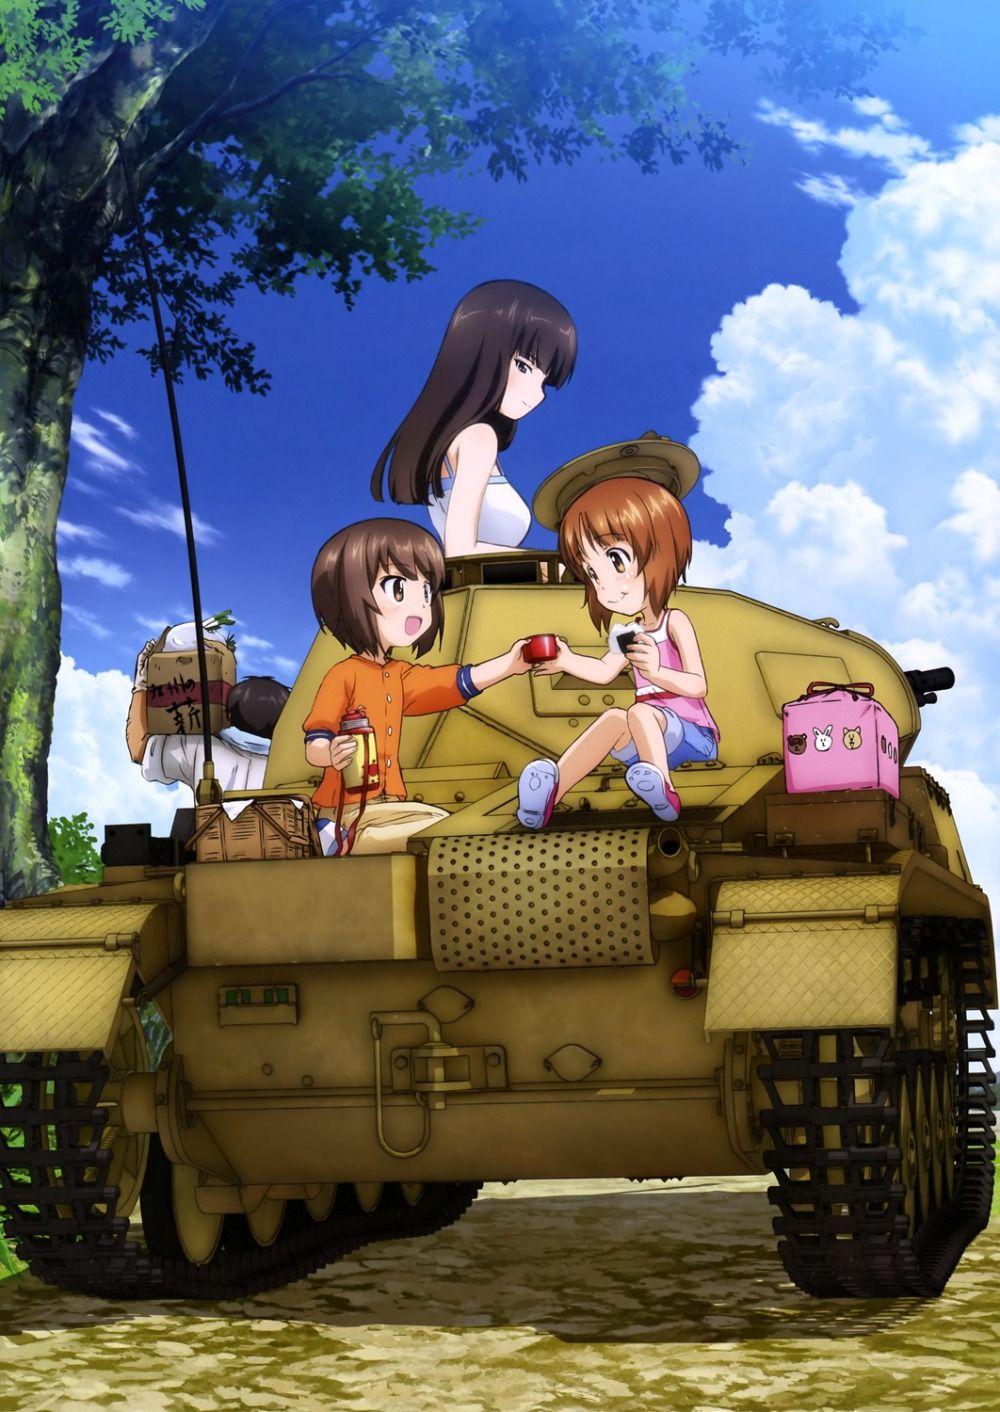 Cute Tuesday 108 Manga Girl Anime Tank Yandere